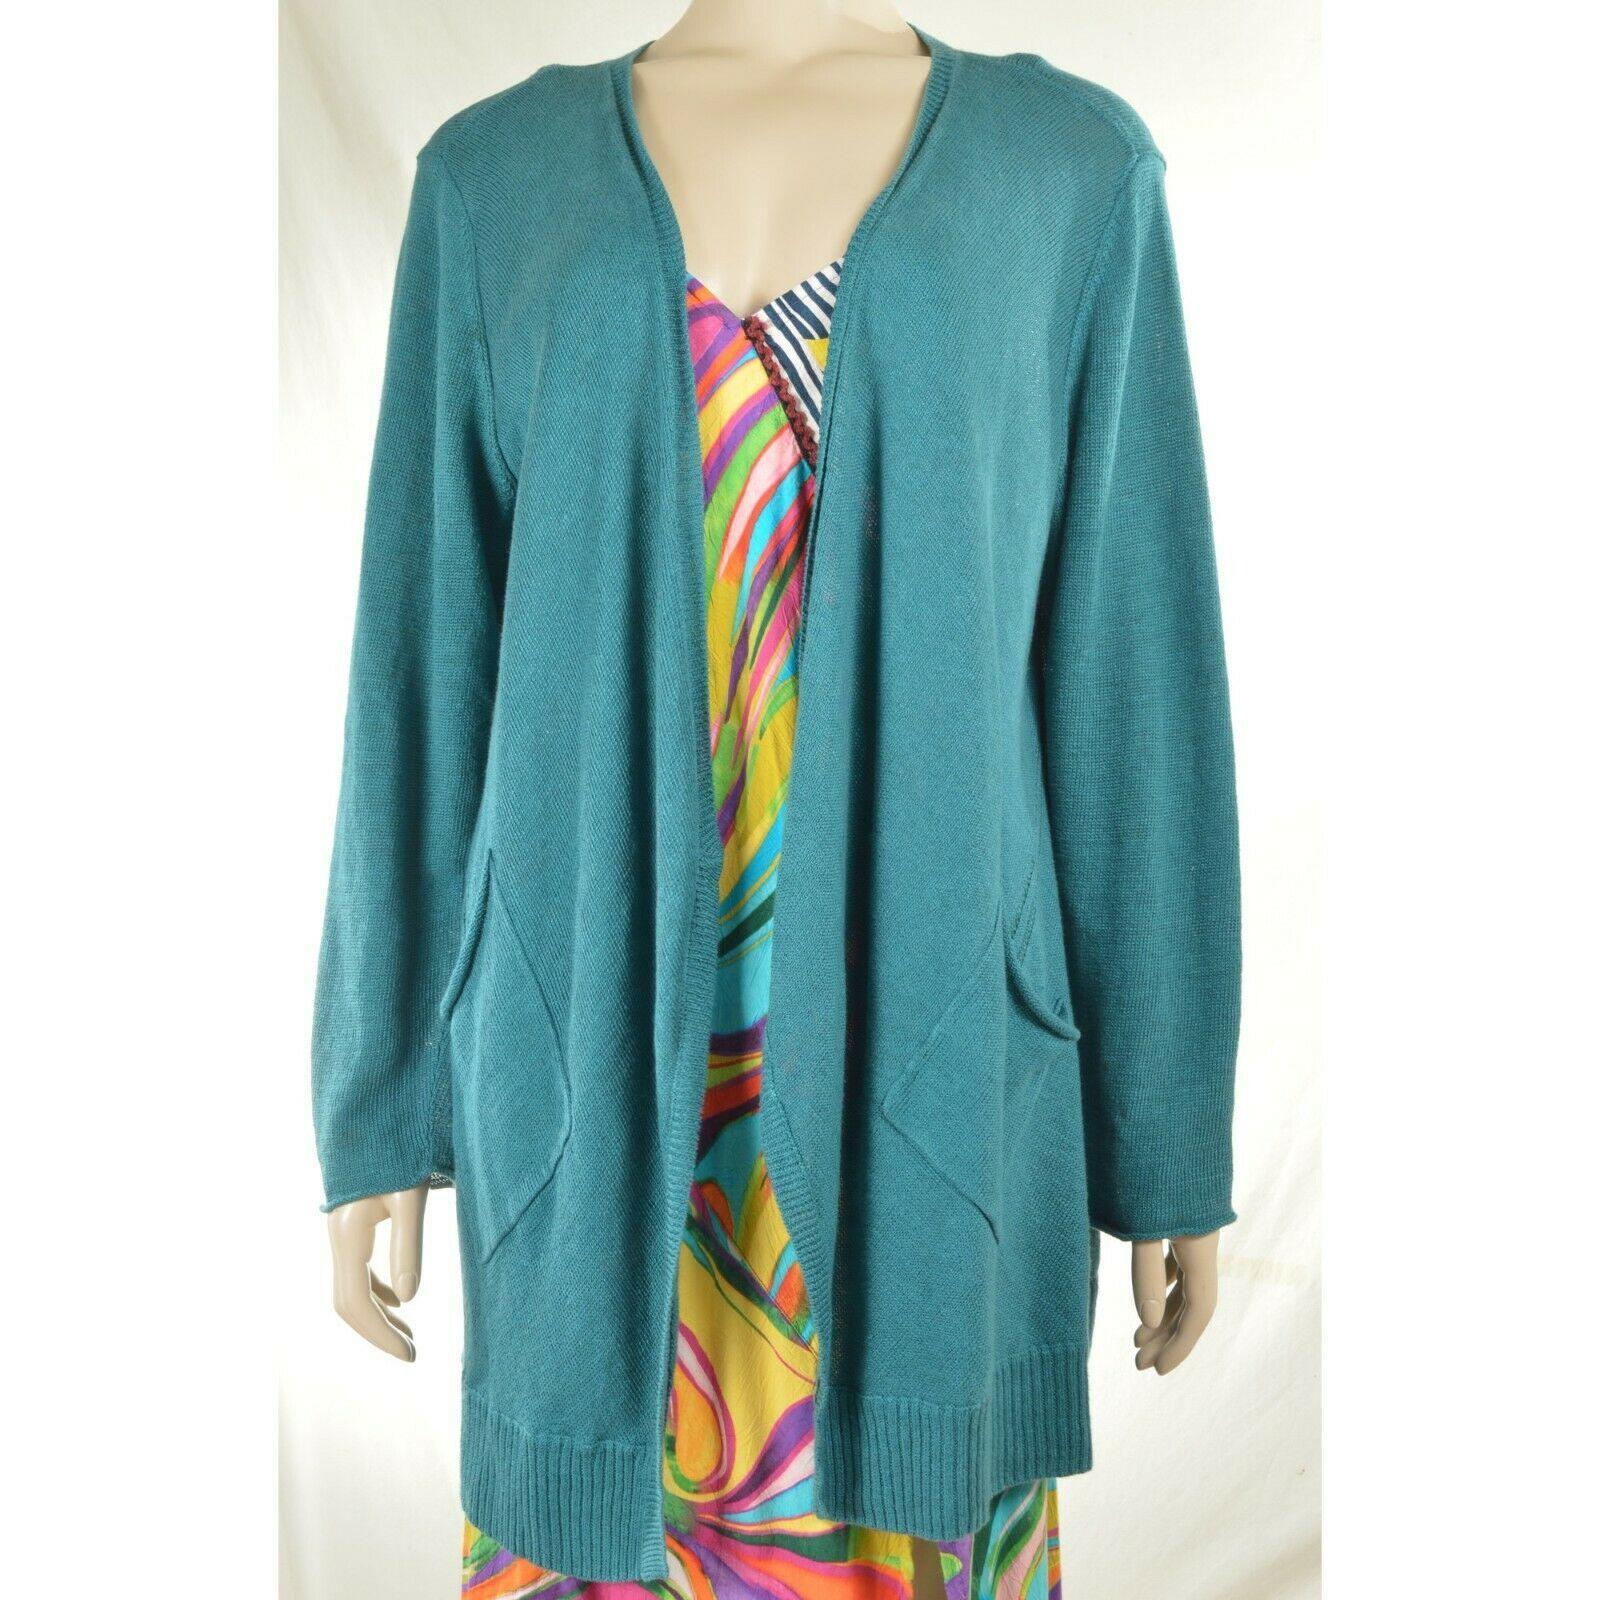 Eileen Fisher sweater cardigan SZ L teal 100% linen knit pockets soft long s